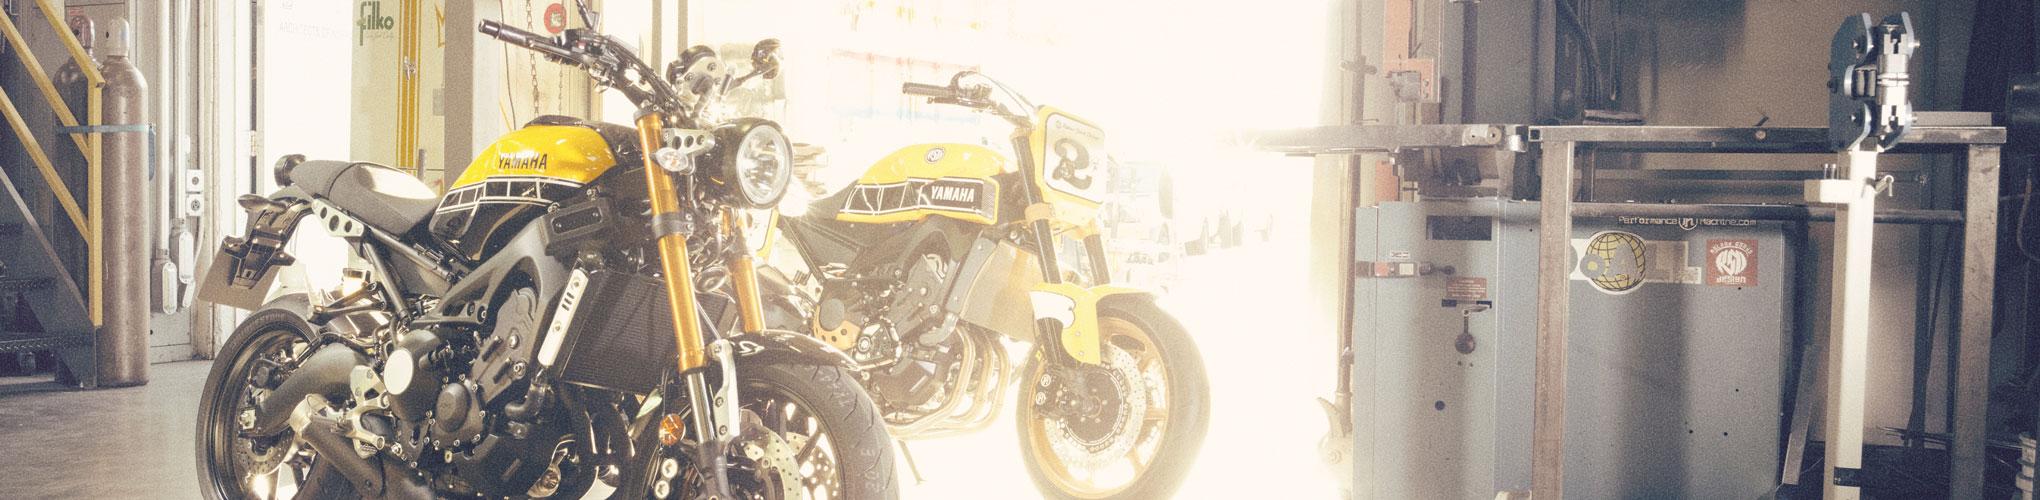 Kleppen stellen motorfiets | MotorCentrumWest